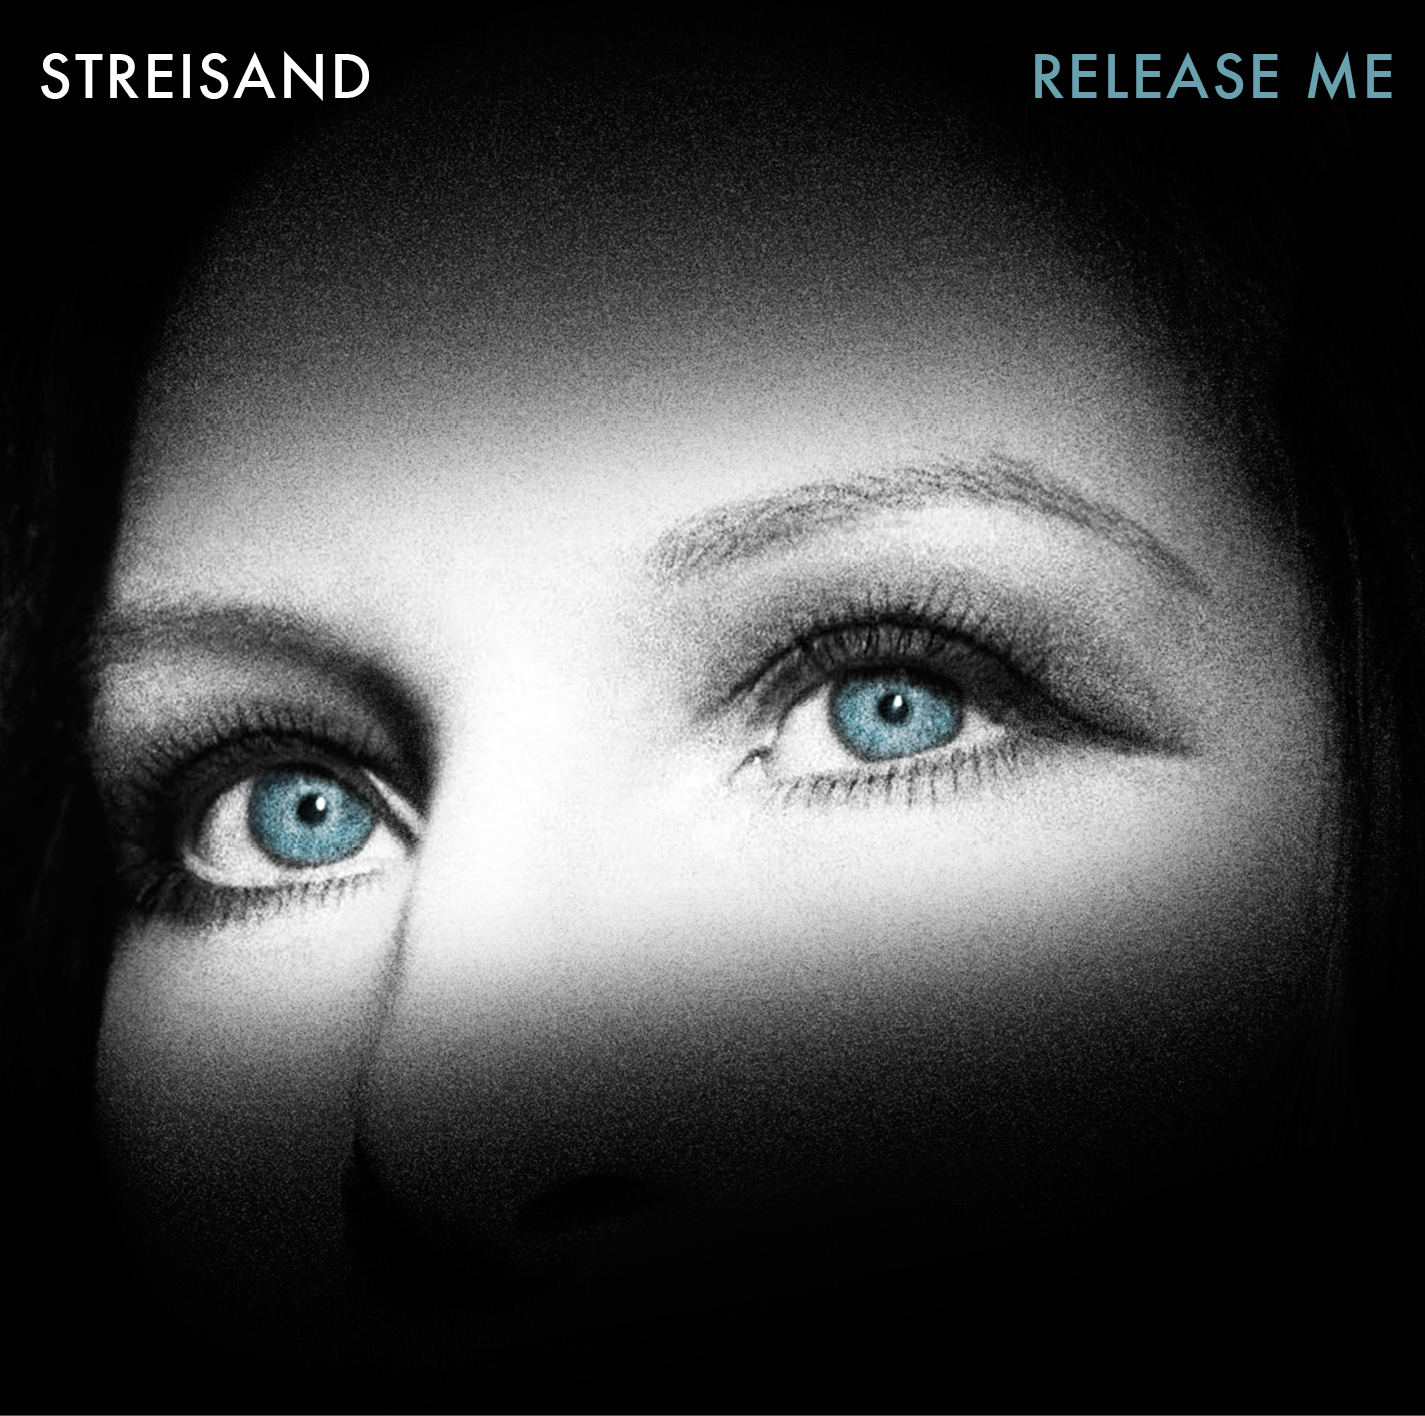 http://2.bp.blogspot.com/-z9NyJAmEIcg/UHszP0u5pzI/AAAAAAAAEB4/gqRrhFFCkRo/s1600/Barbra+Streisand+Release+Me.jpg